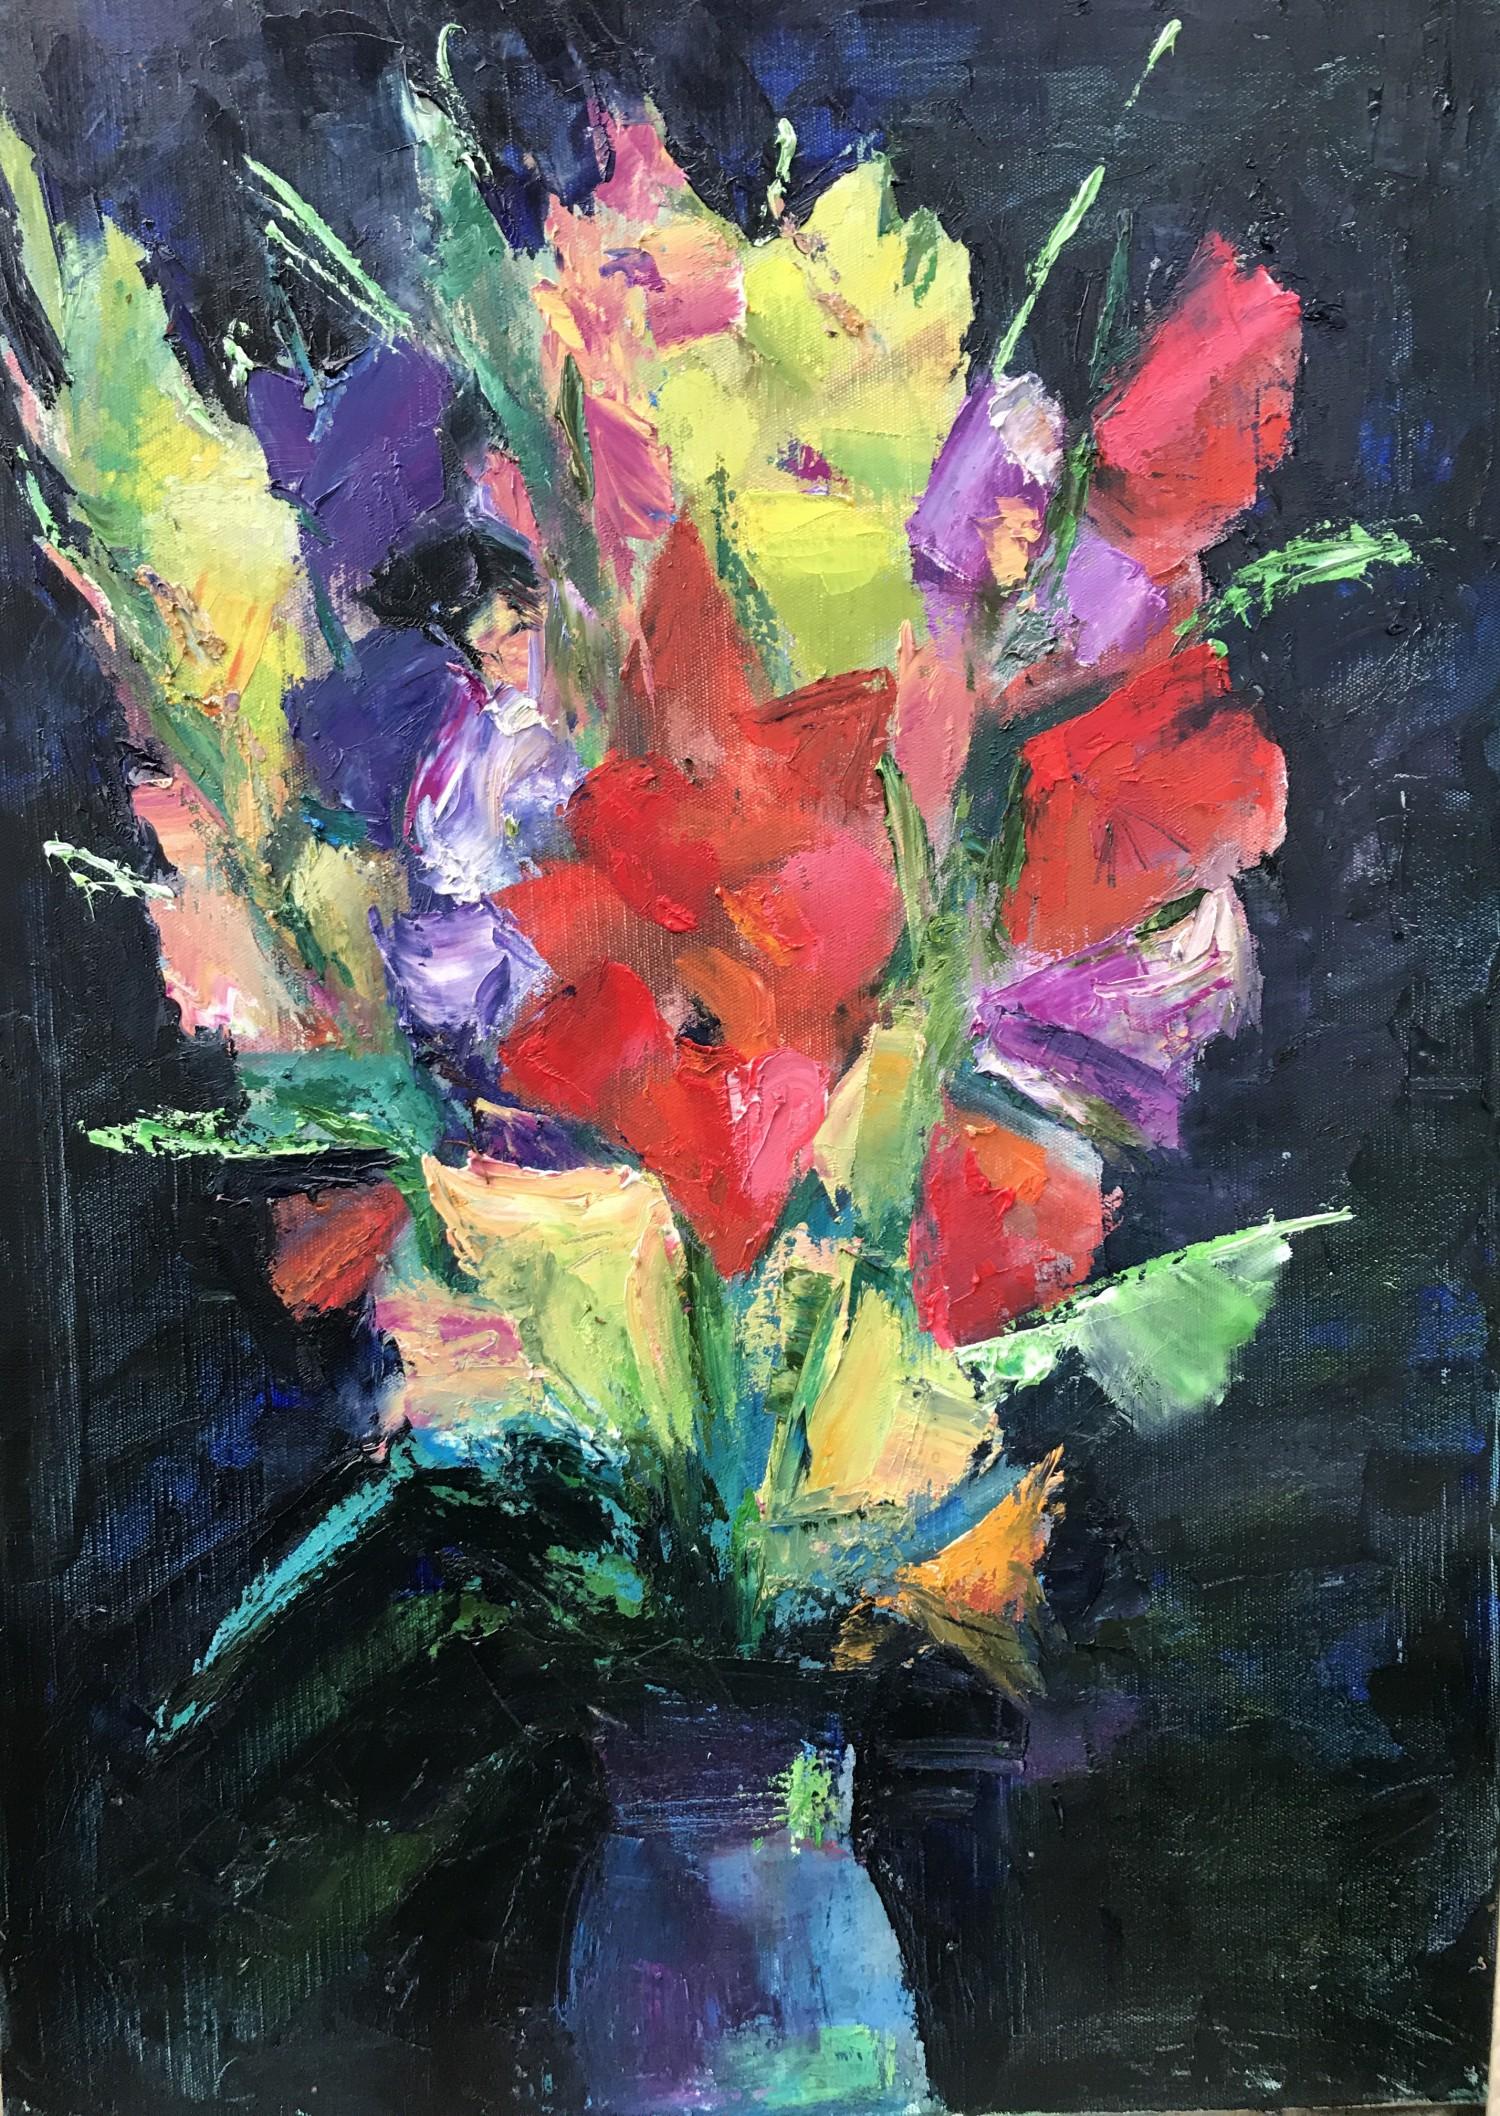 Н.Н.Мухина. Гладиолусы. Х.м., 50х70 см. 2017 г.